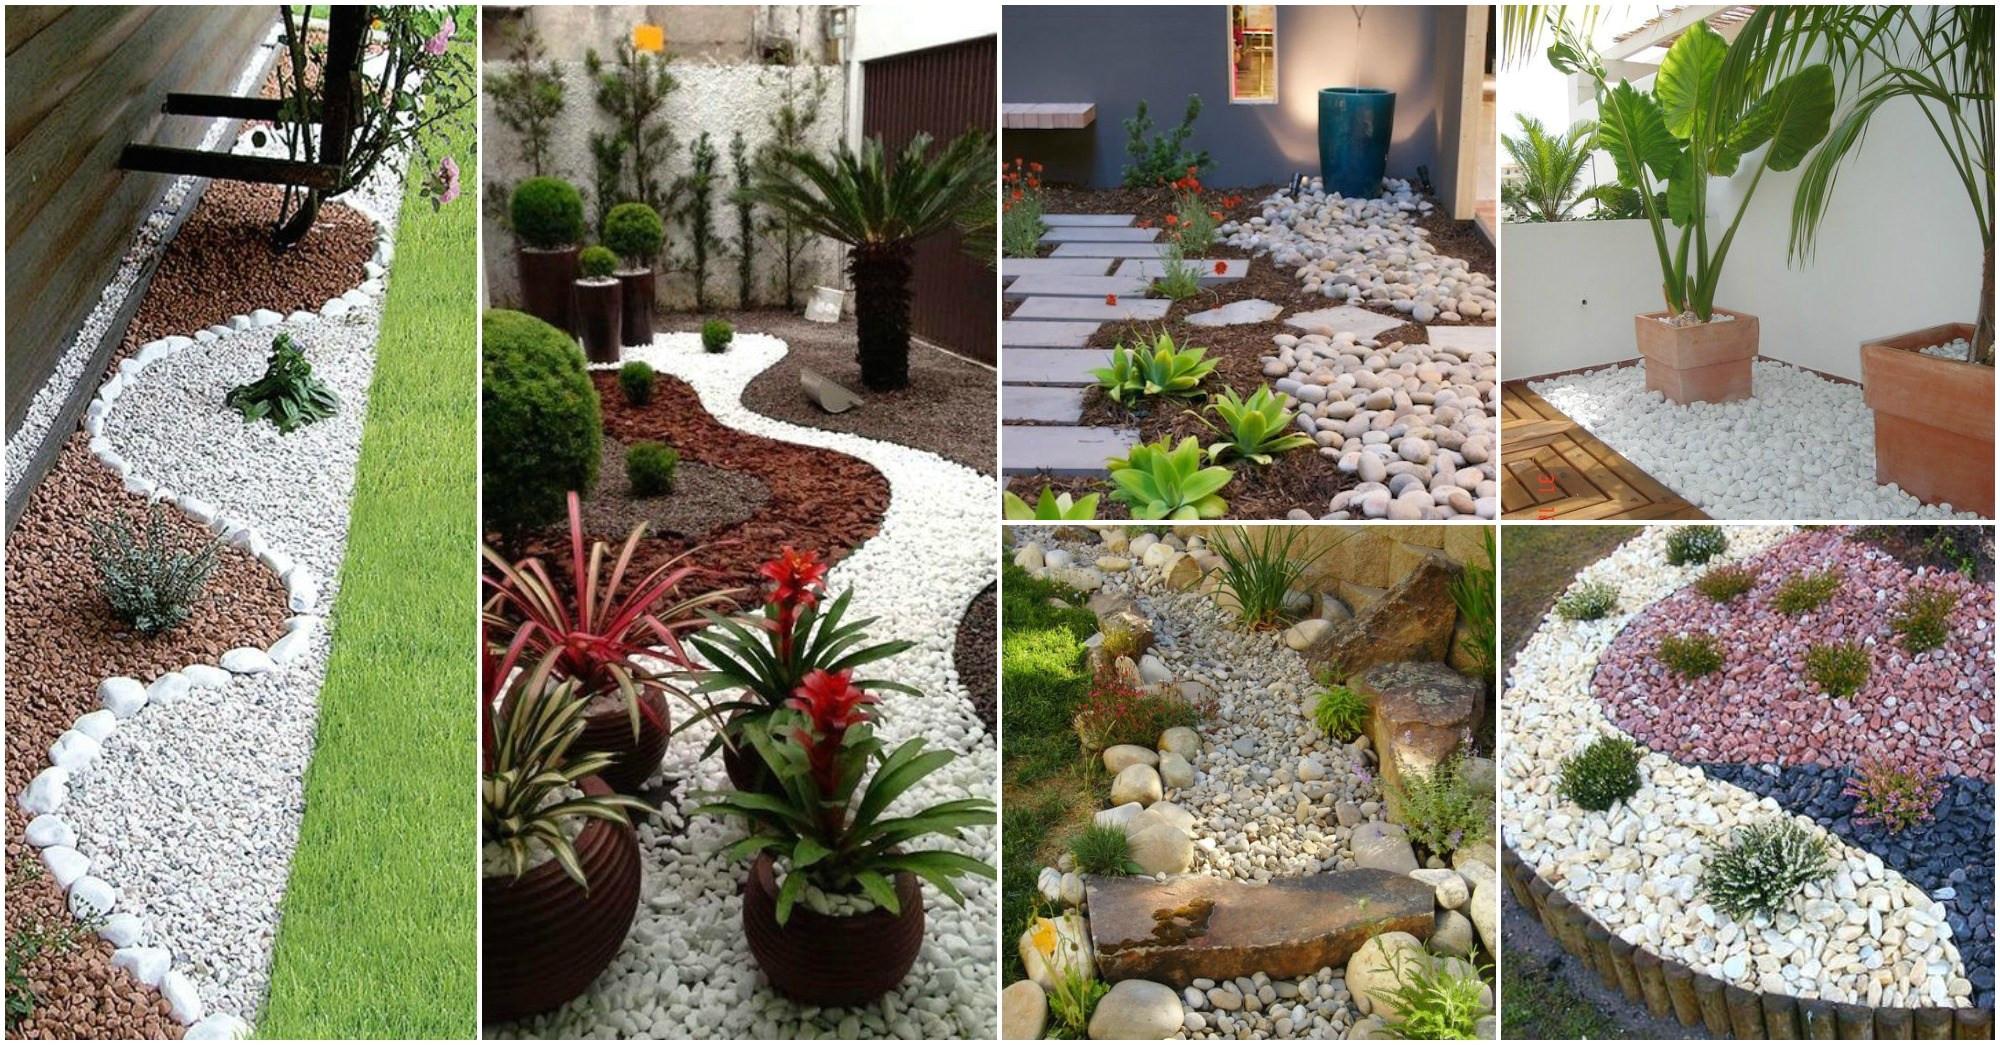 Jardines peque os para frentes de casas con piedras for Jardines pequenos para frentes de casas